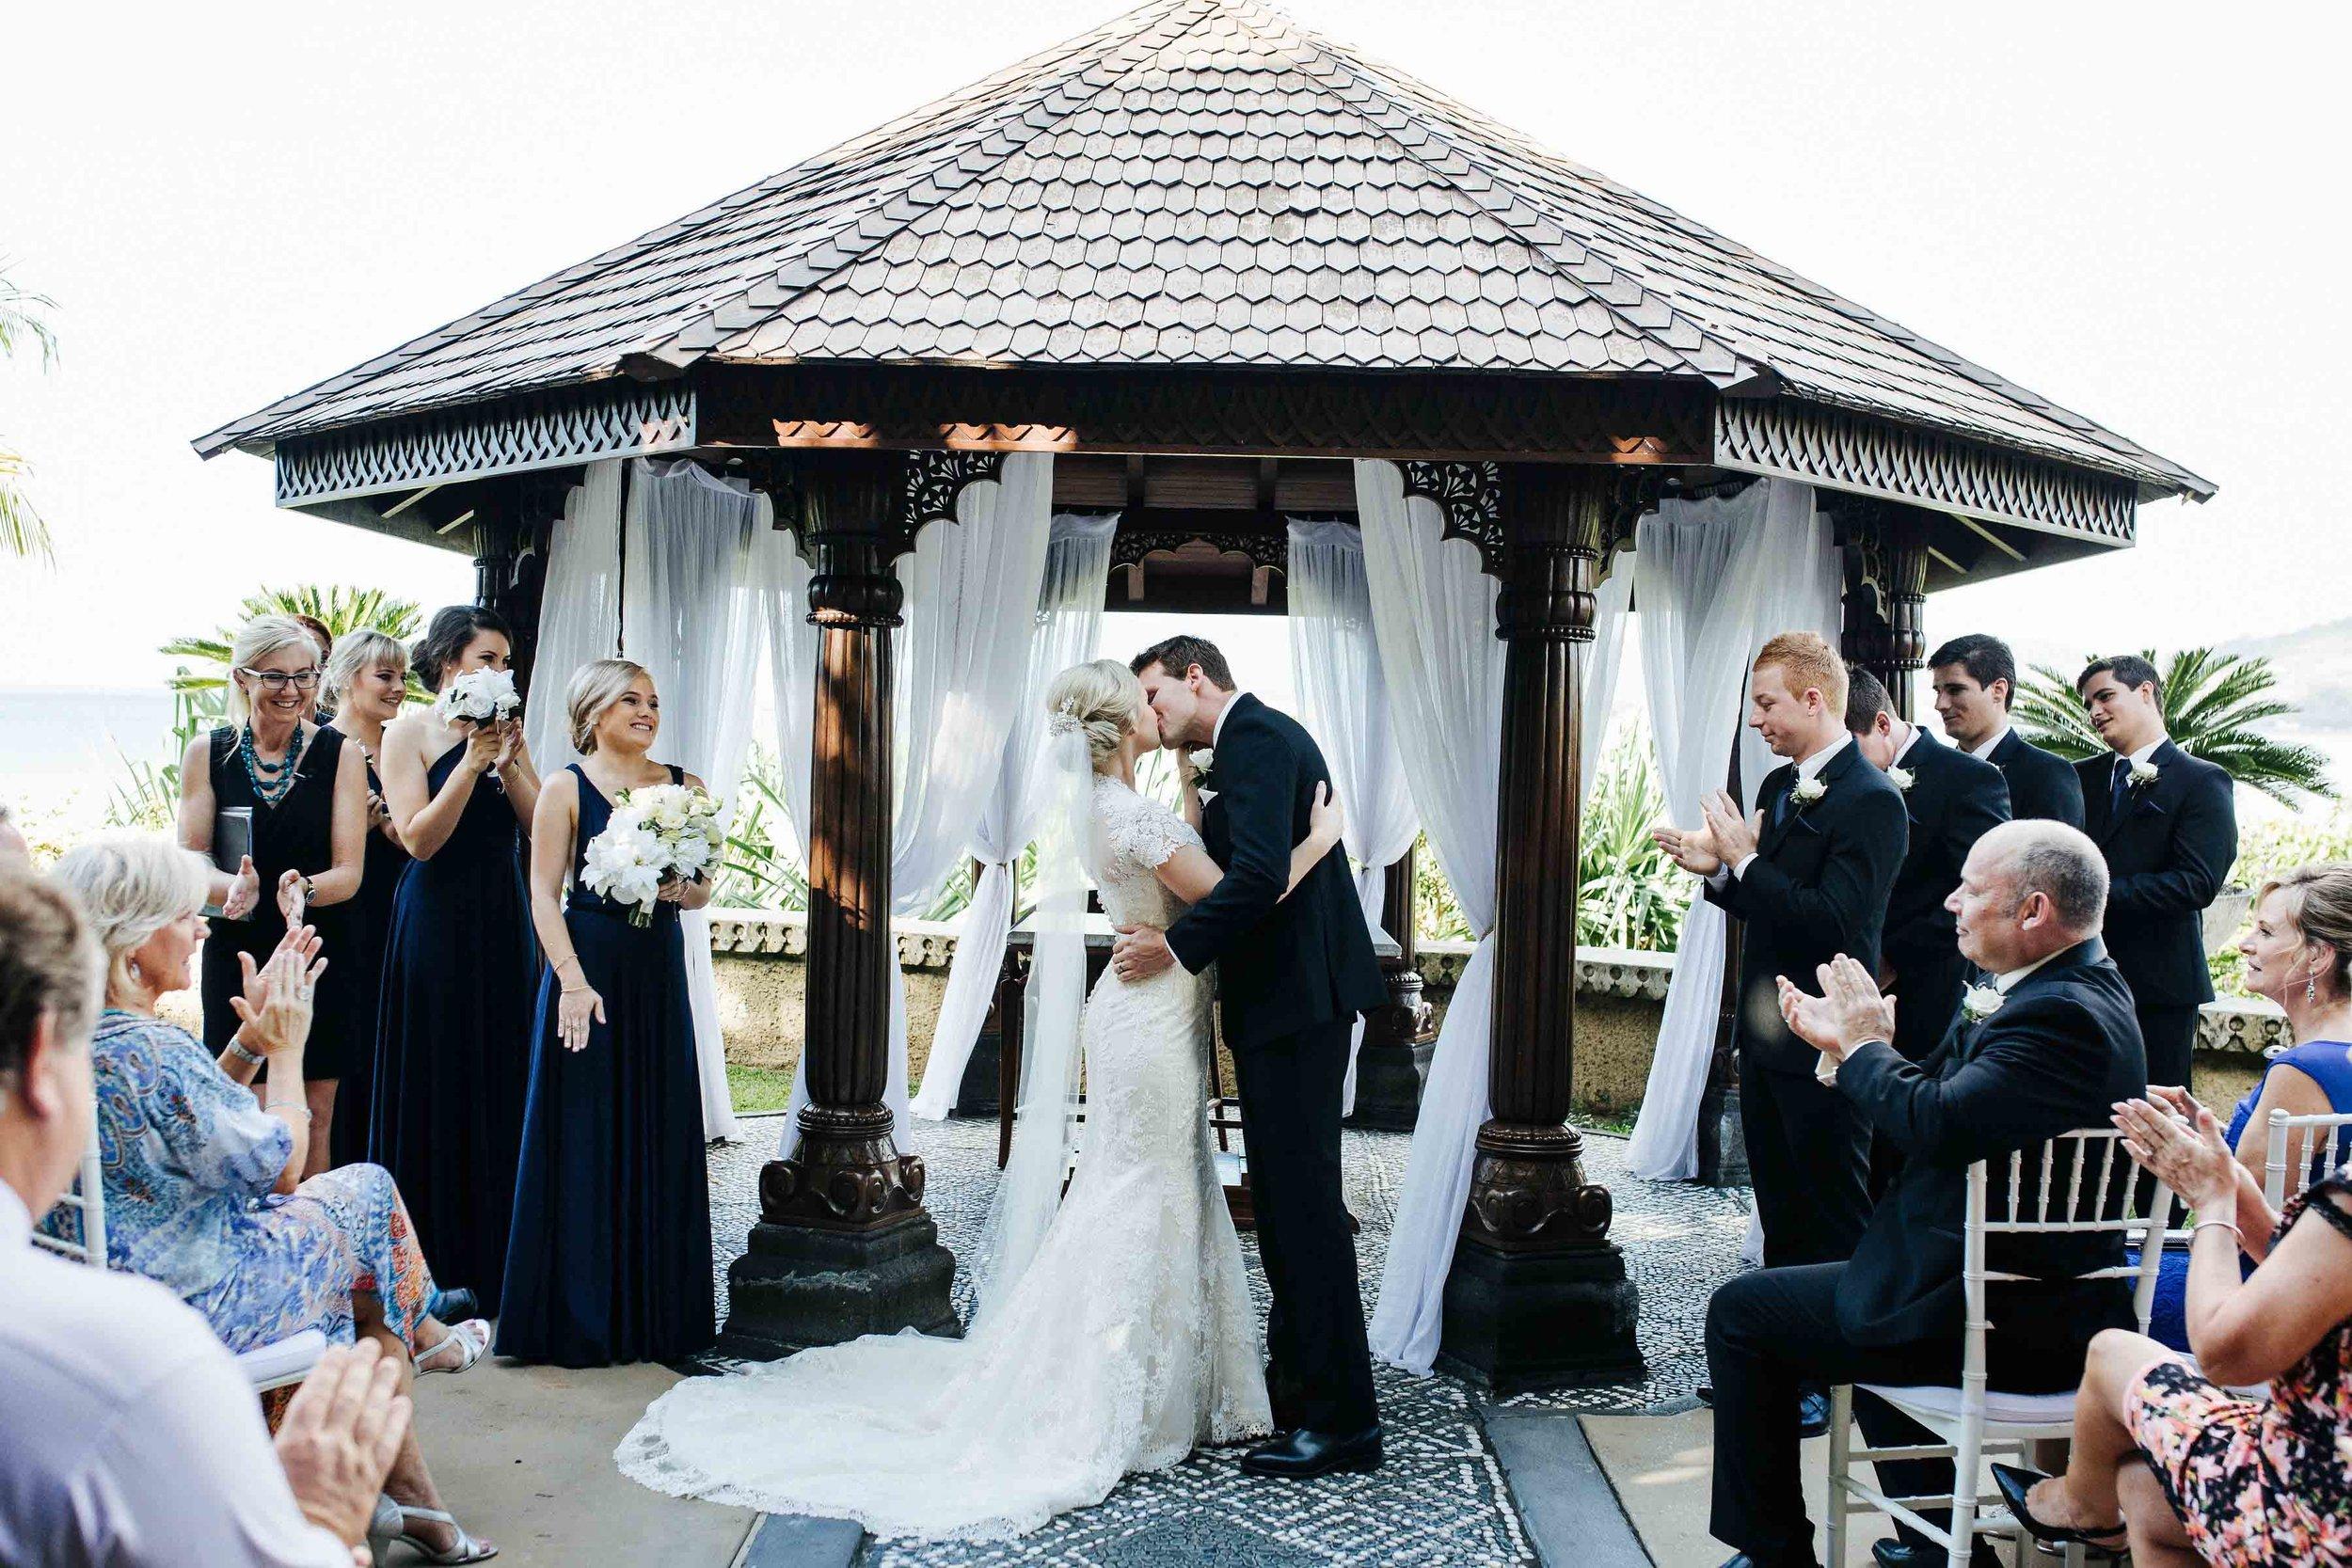 lrKaitlin-Reece-Villa-Botanica-wedding-photography-Playback-Studios272of708.jpg